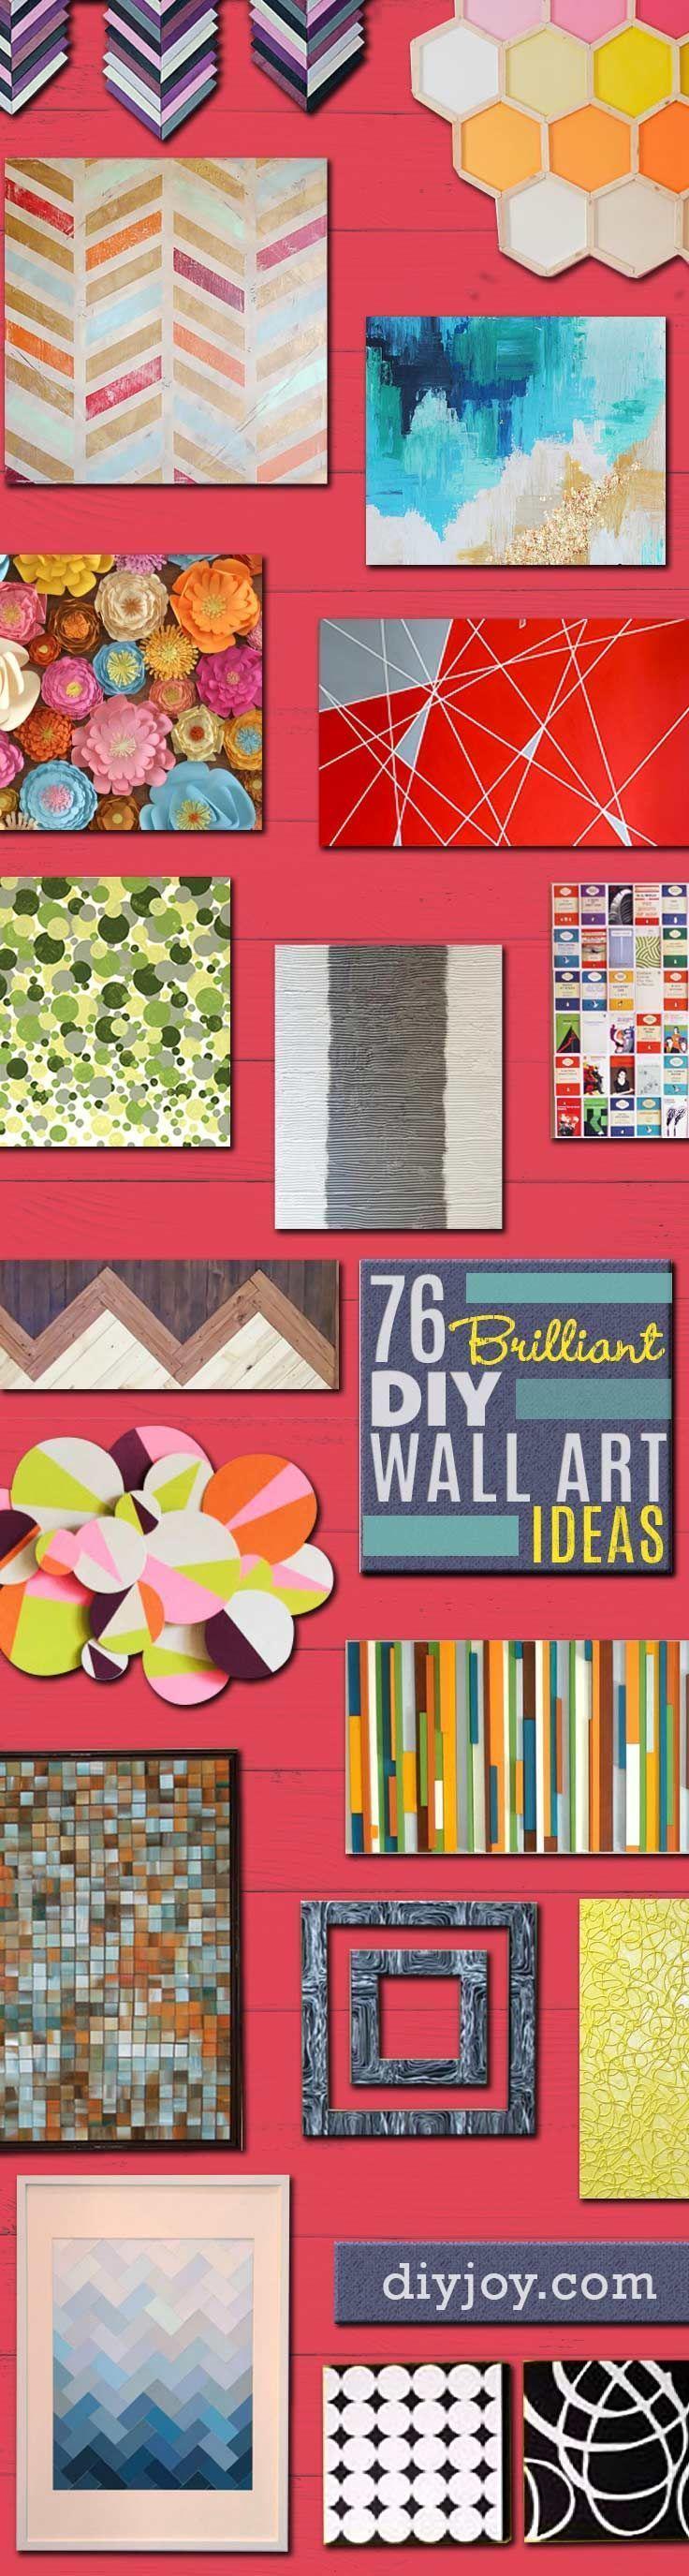 76 brilliant diy wall art ideas for your blank walls do for Blank wall ideas